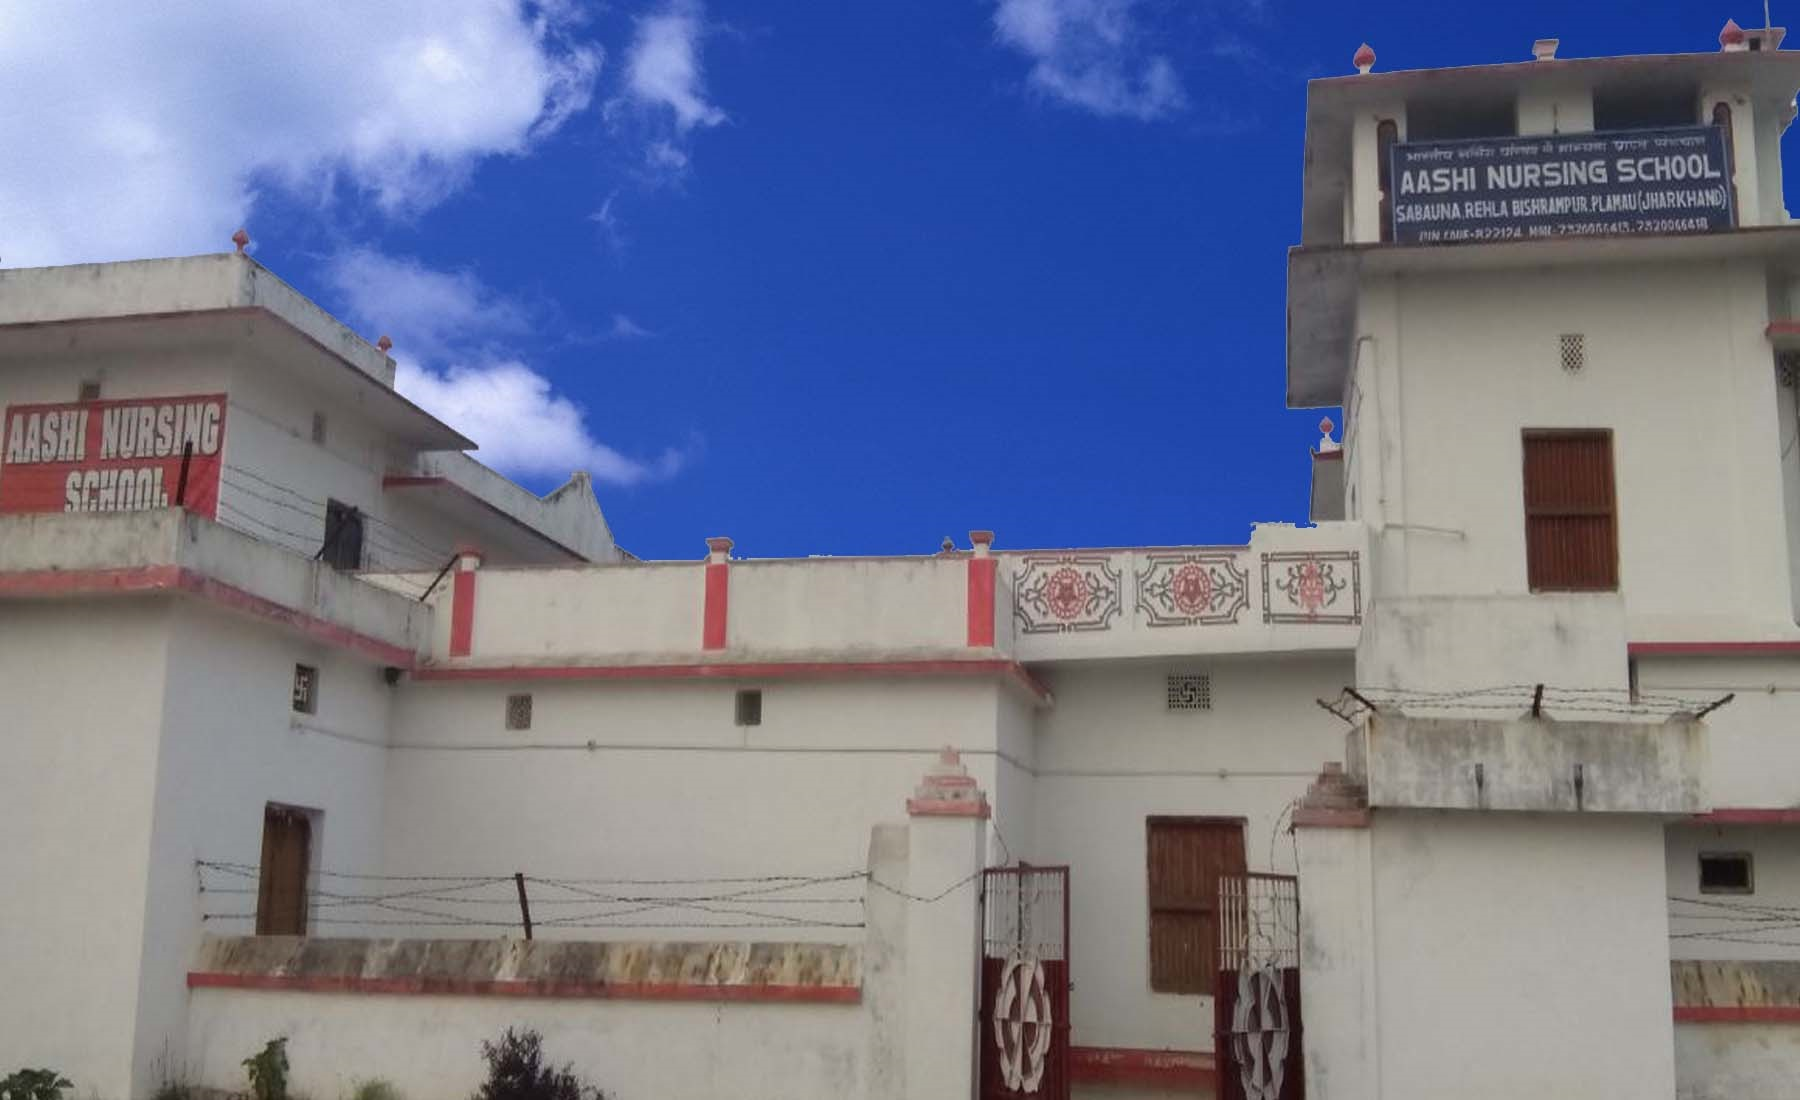 Aashi Nursing School